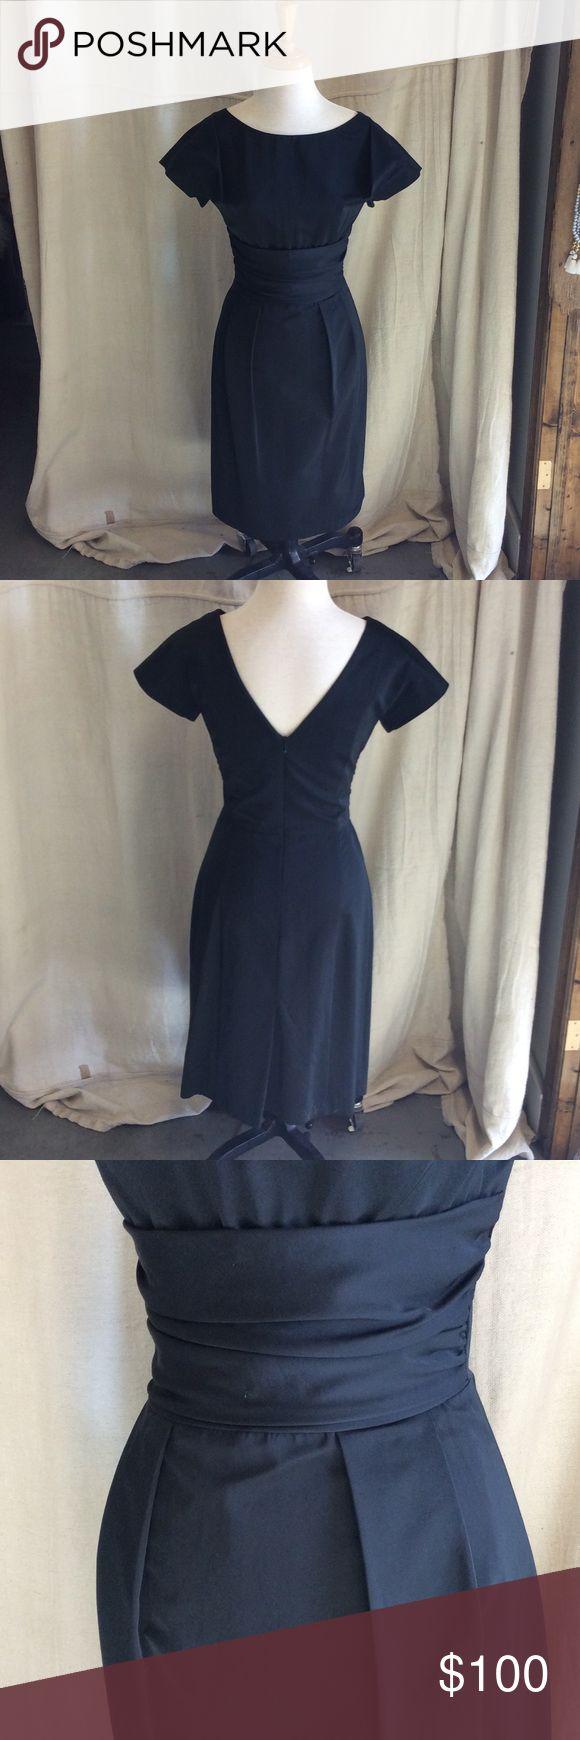 René Lezard Classic LBD A classic and flattering little black dress by René Lezard, size 34. Trades not accepted, prices are firm. René Lezard  Dresses